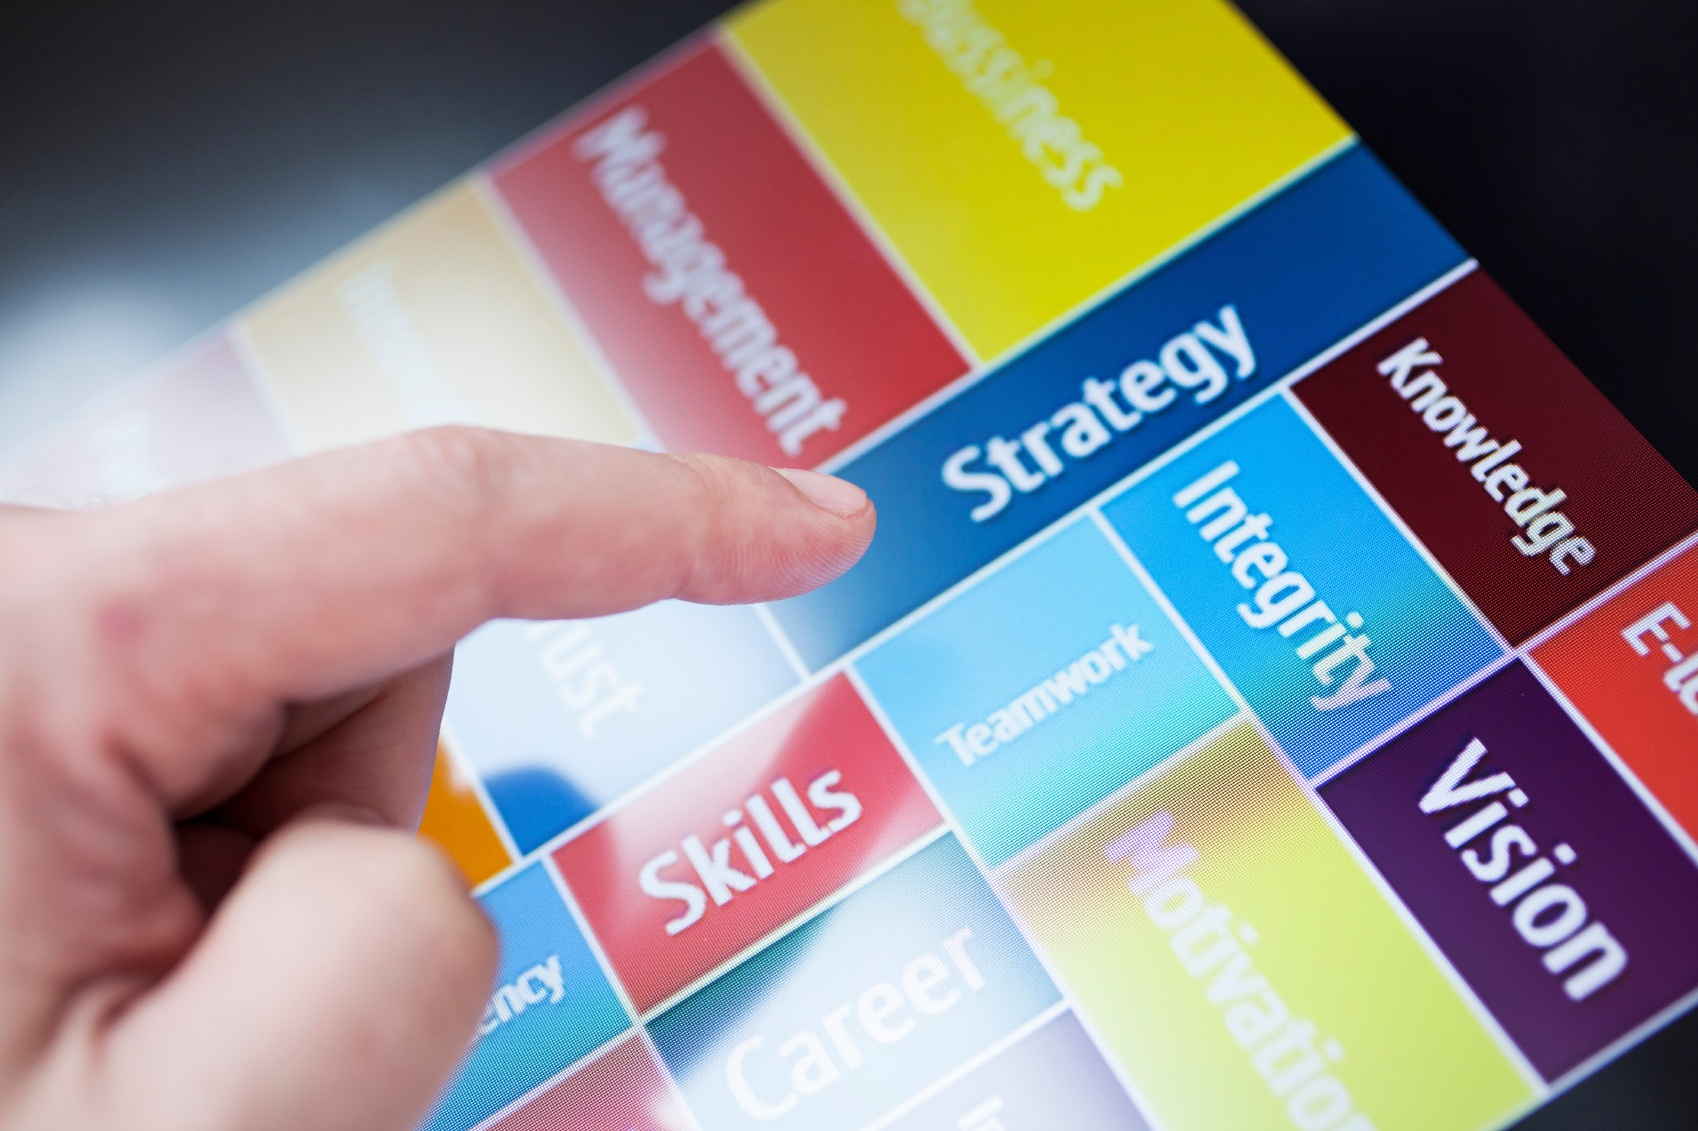 financial advisor business plan Revealing the important dictates of a good financial advisor business plan for starting up all sizes of financial advisor businesses.